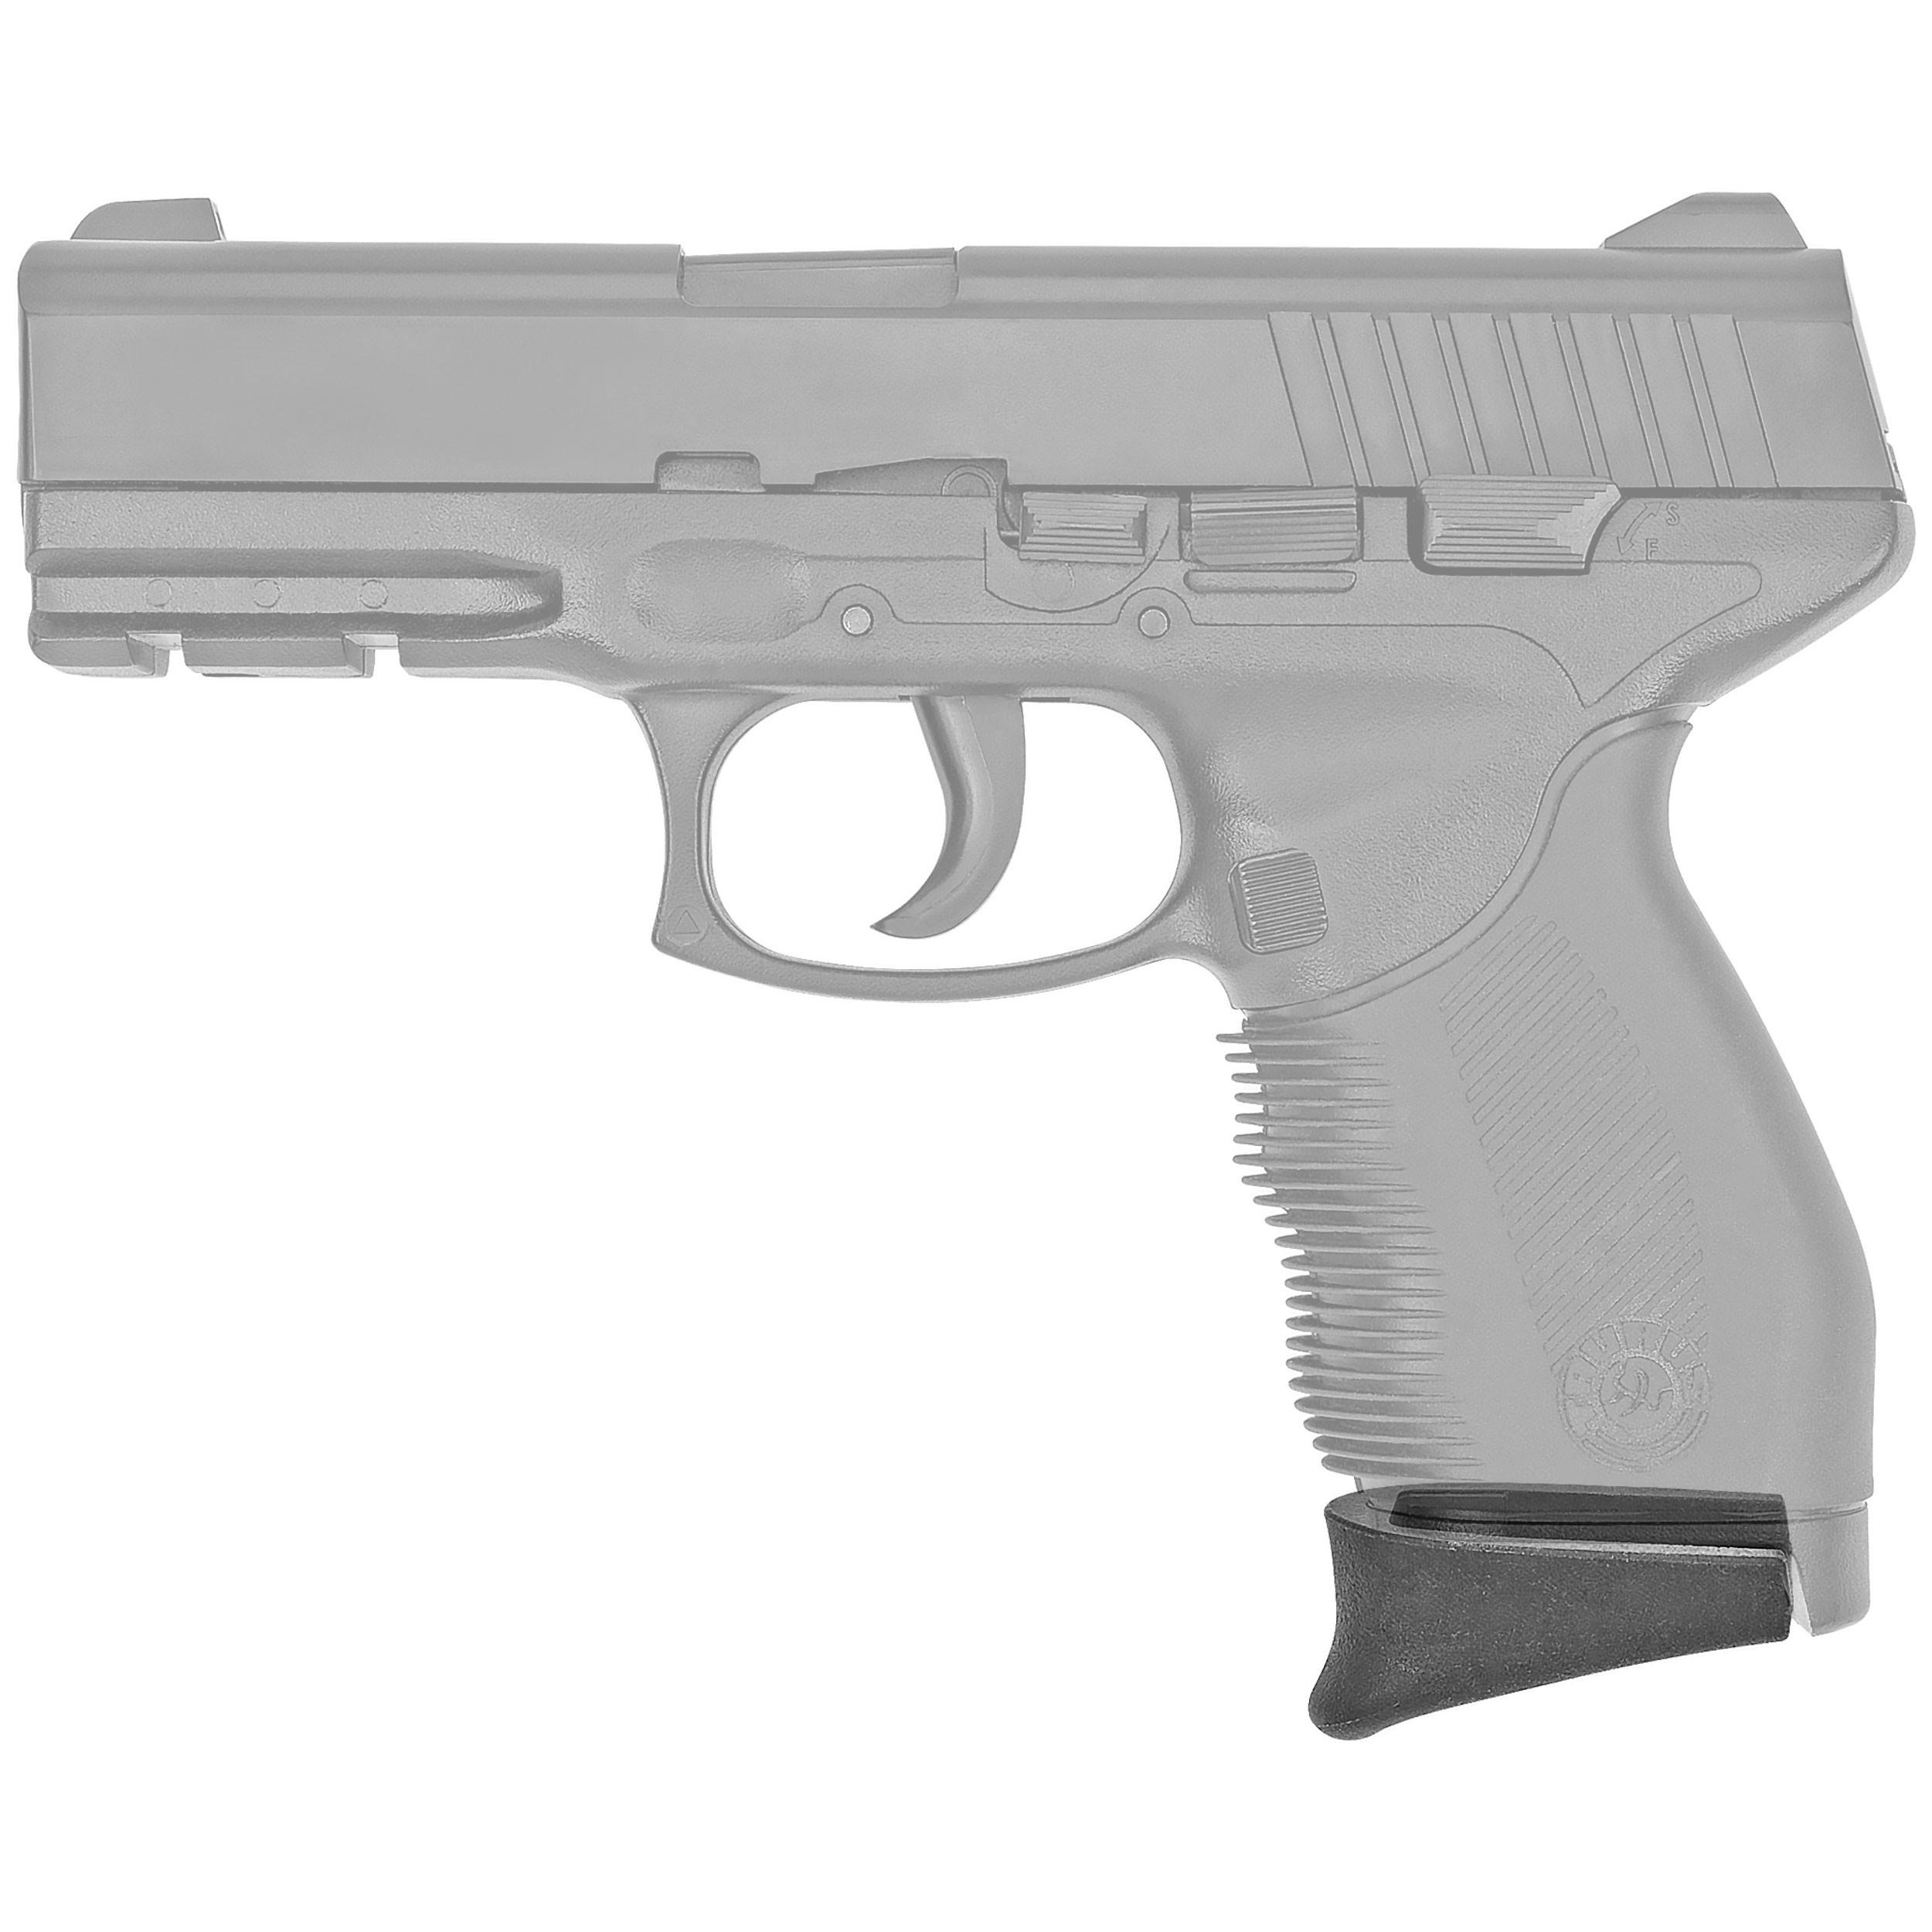 "BOOMSTICK Gun Accessories Glock Grip Extension Fits Glock BOOM-10070 26/27/33/39, Pistol 1"" Textured Pinky, Black"